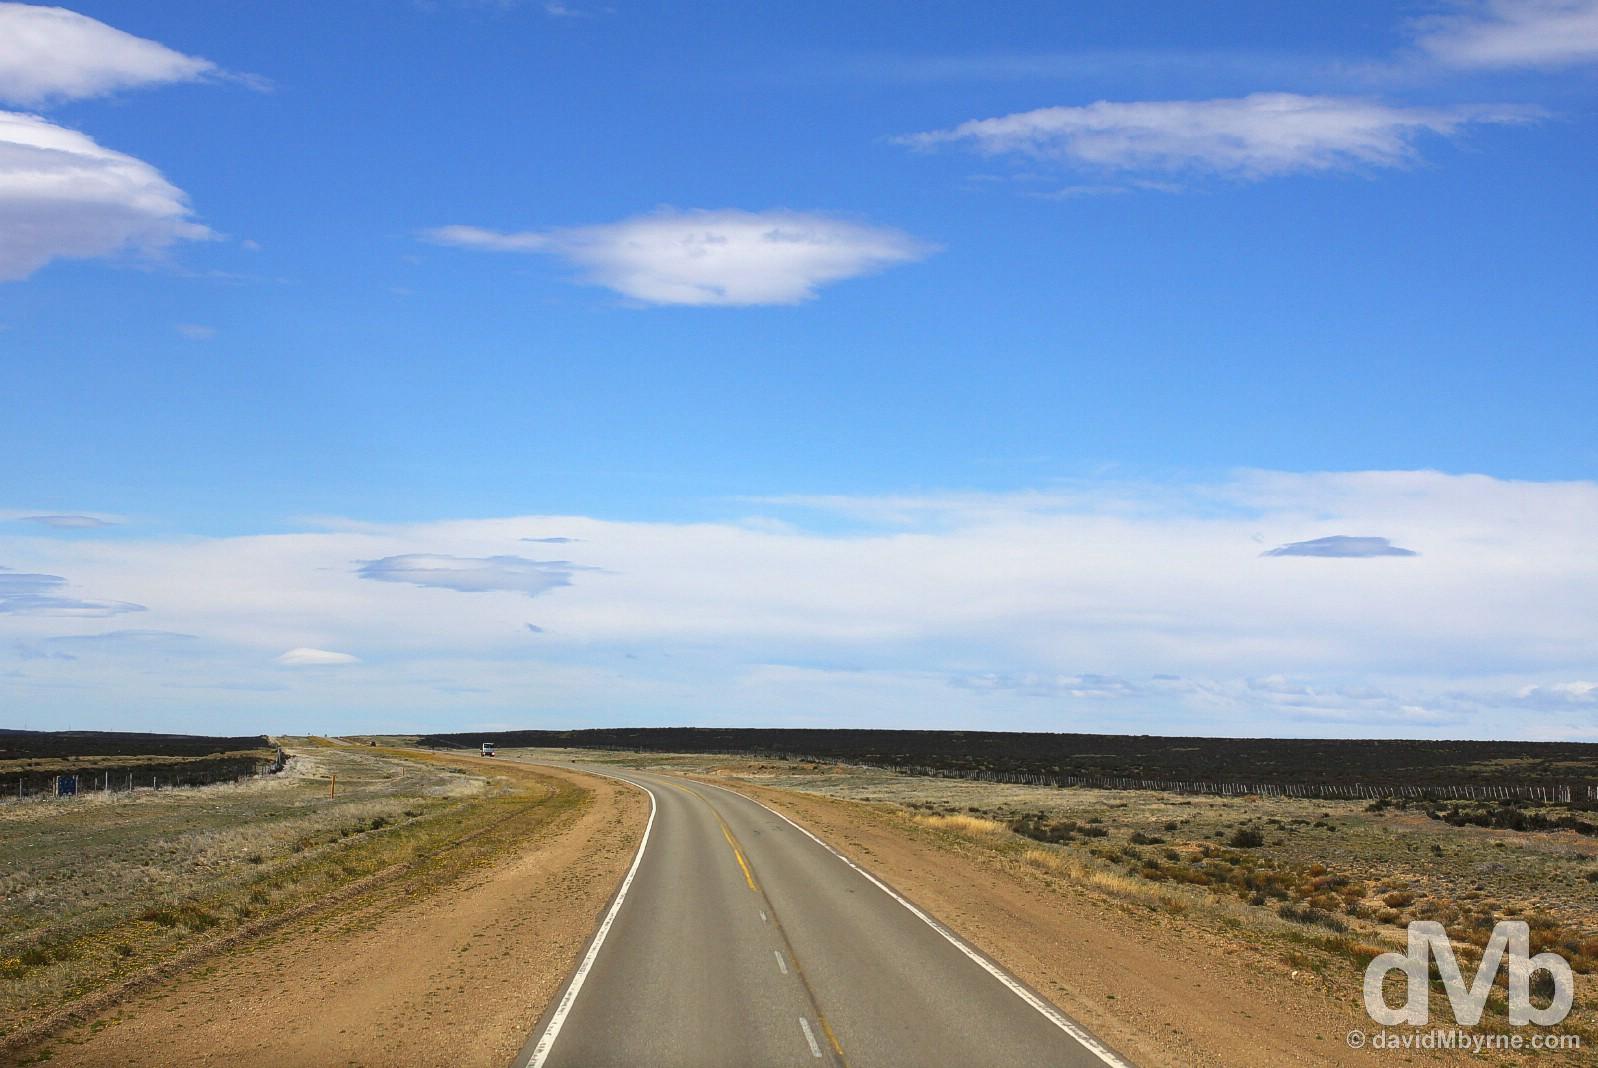 Ruta 5, Patagonia, Argentina. November 1, 2015.